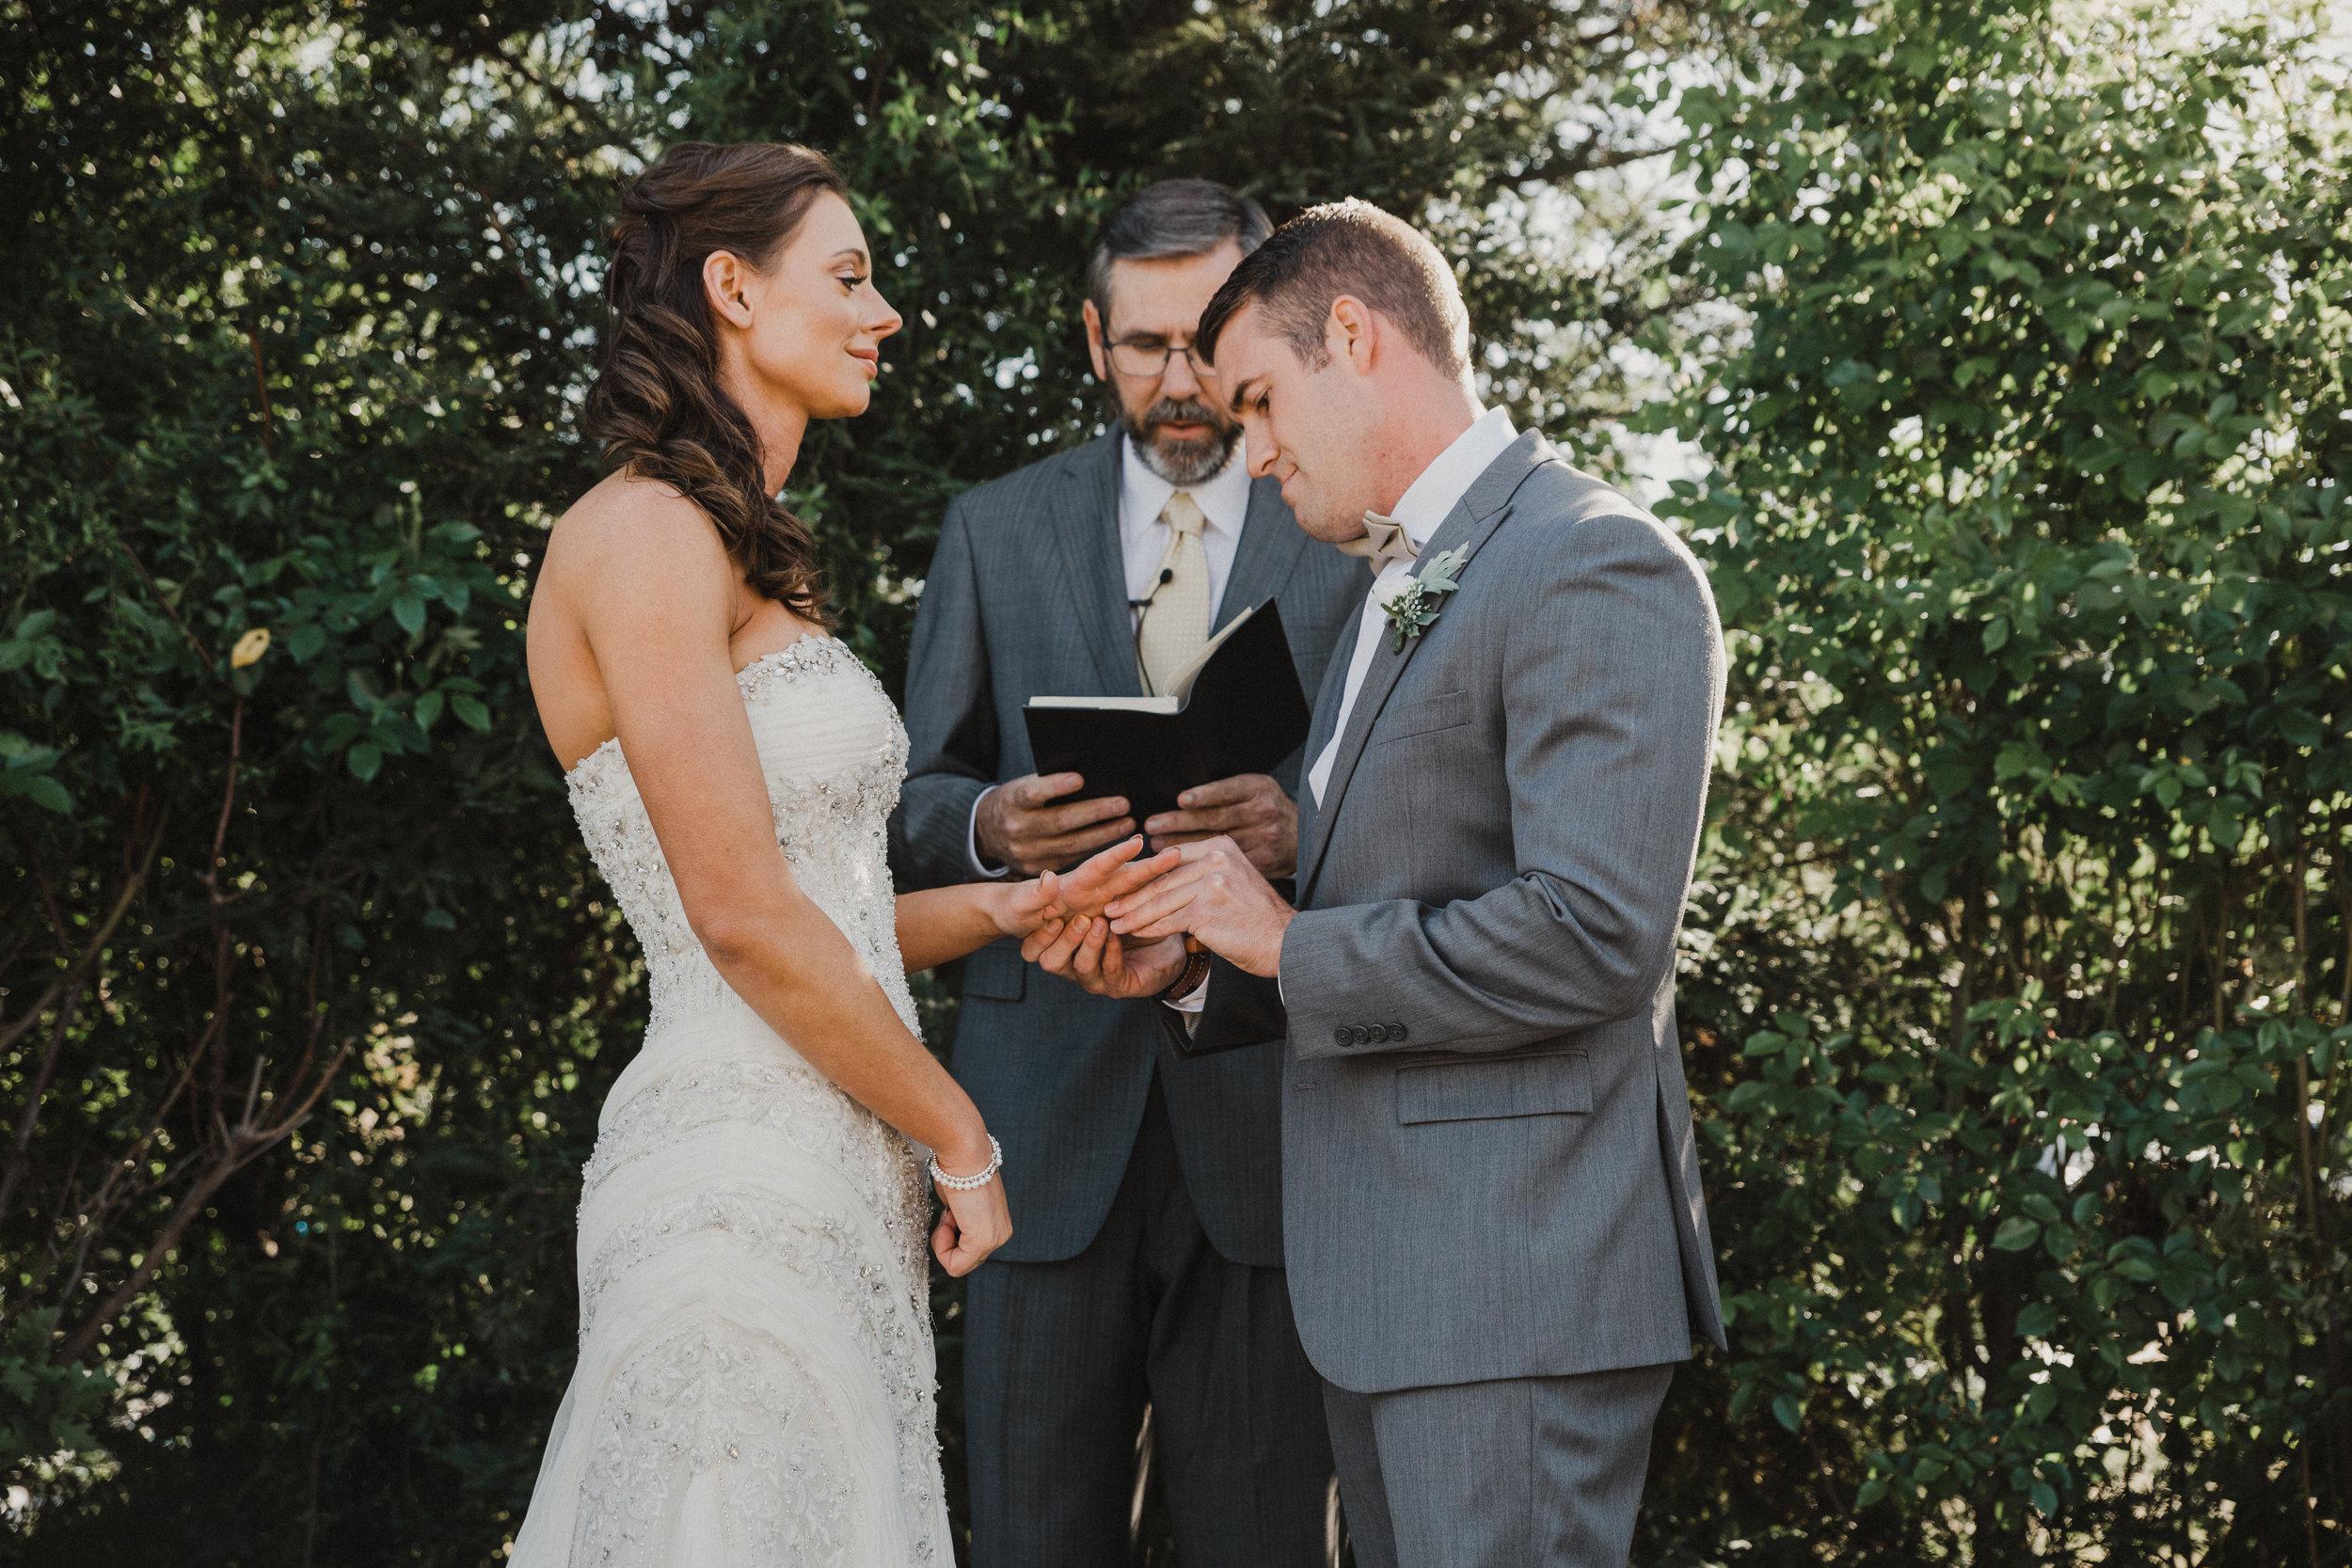 C+J-Grace-Maralyn-Estate-Wedding-Diana-Lake-Photography383.jpg